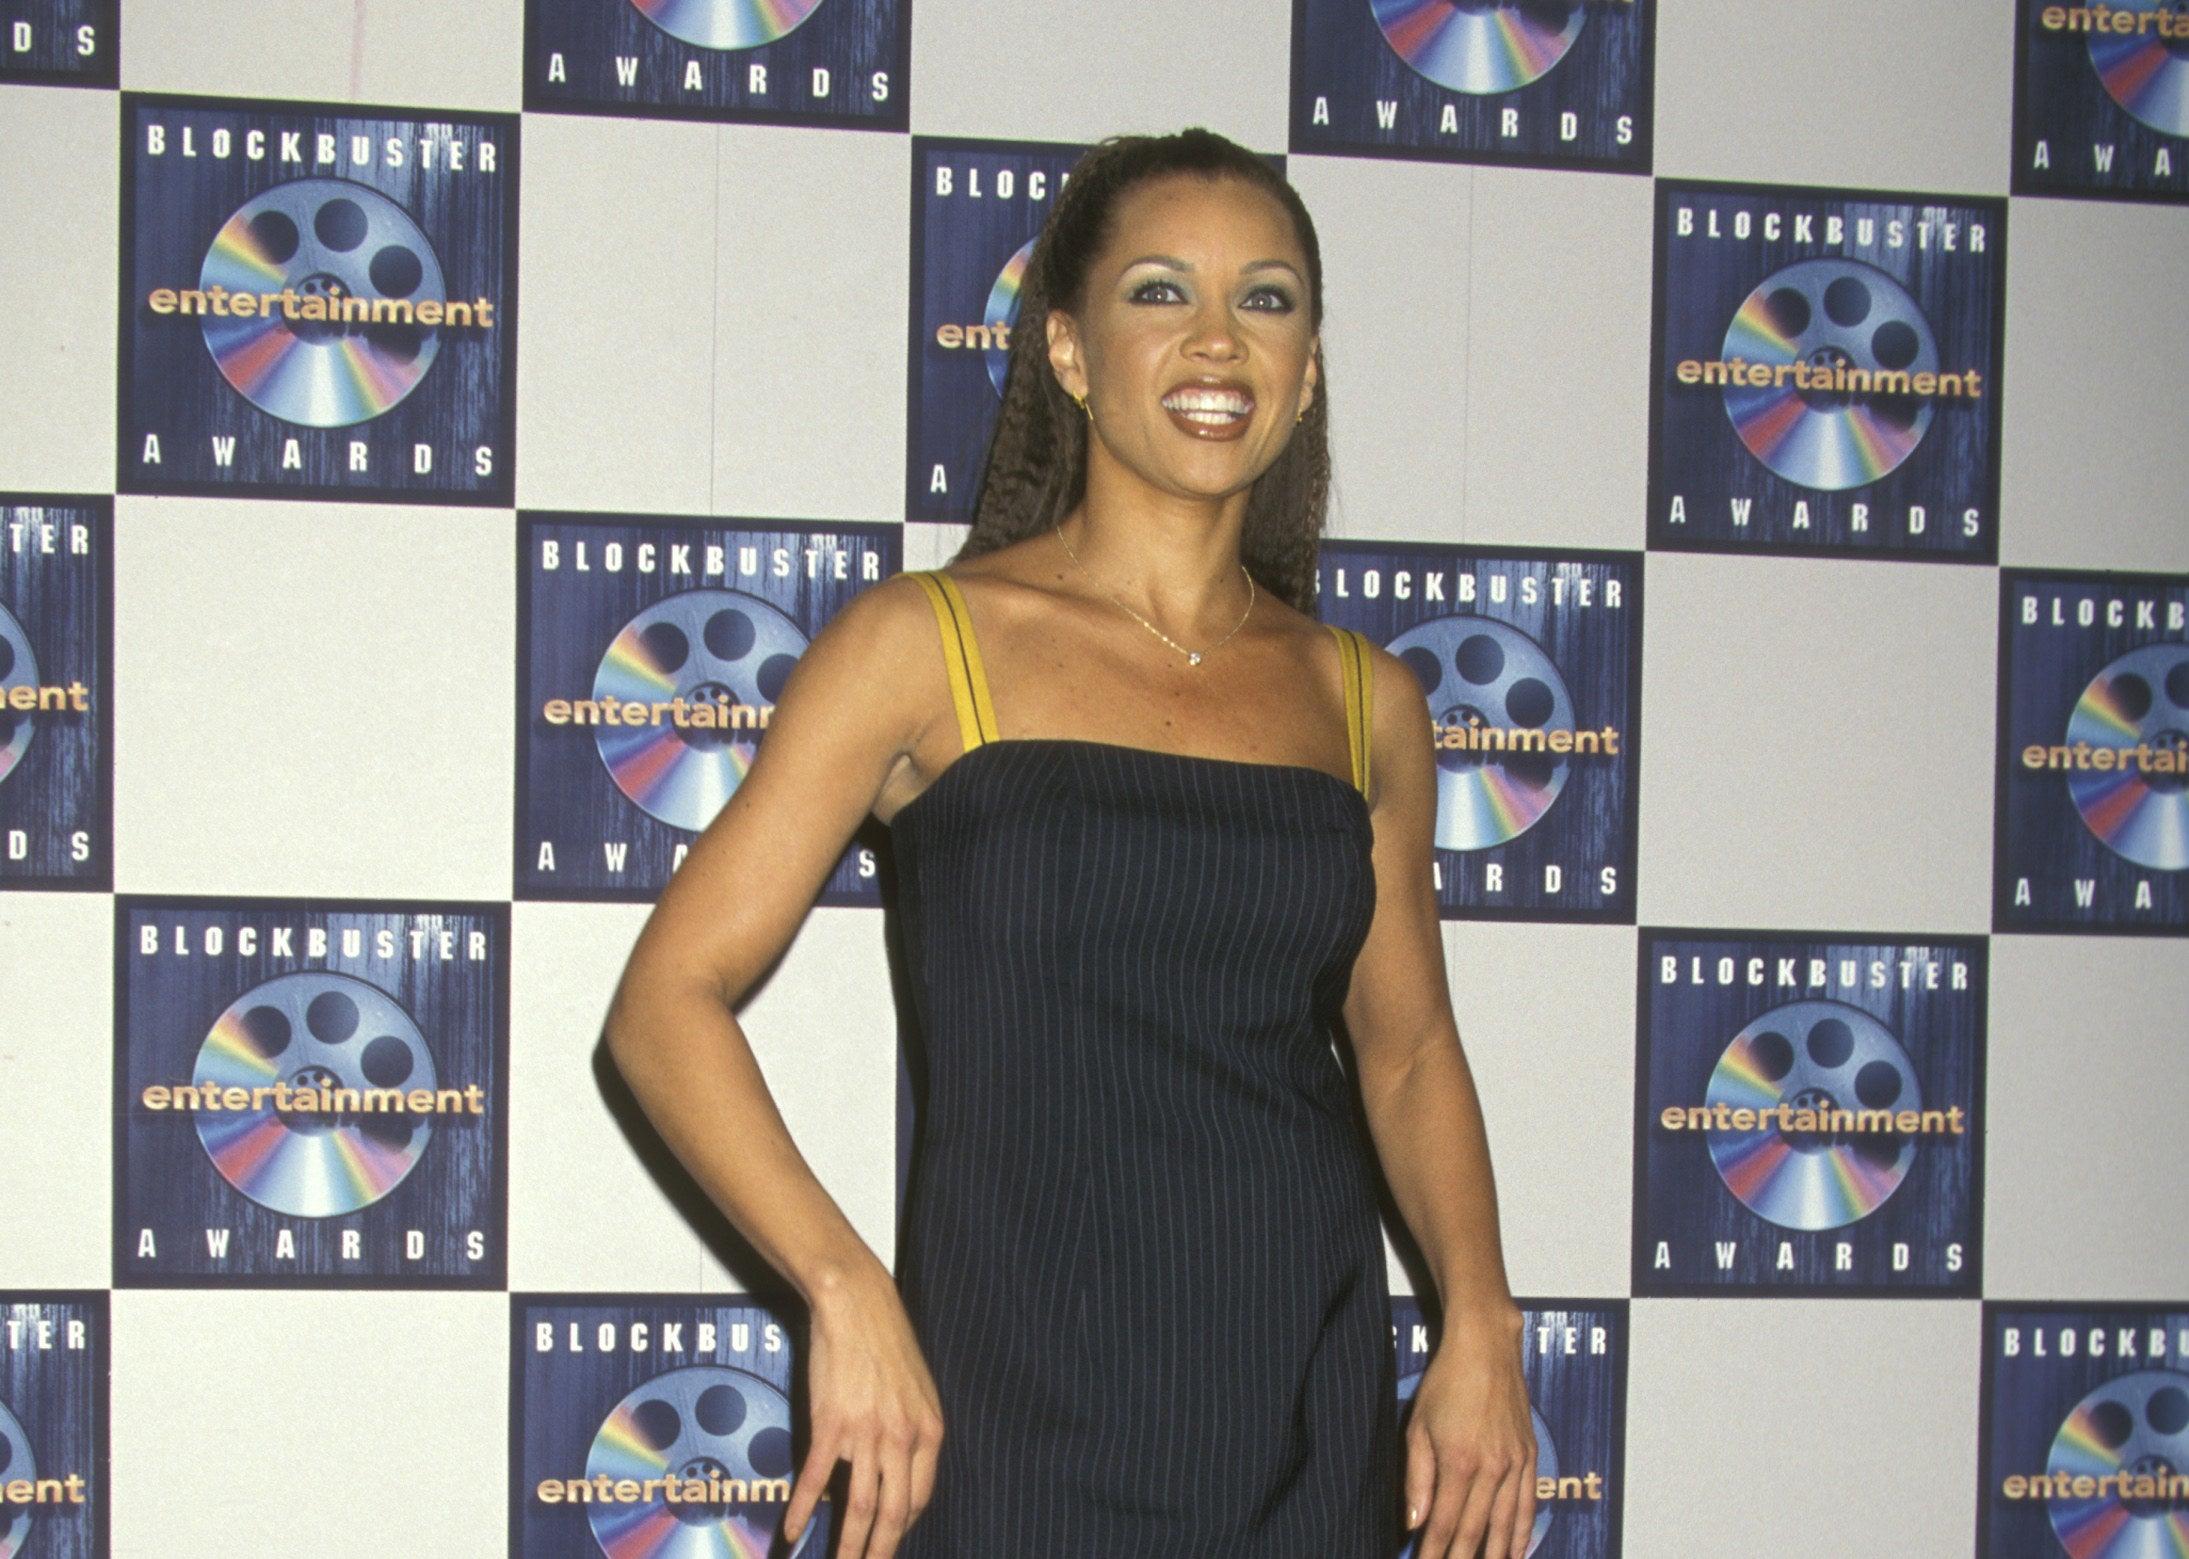 Vanessa Williams backstage at the Blockbuster Entertainment Awards